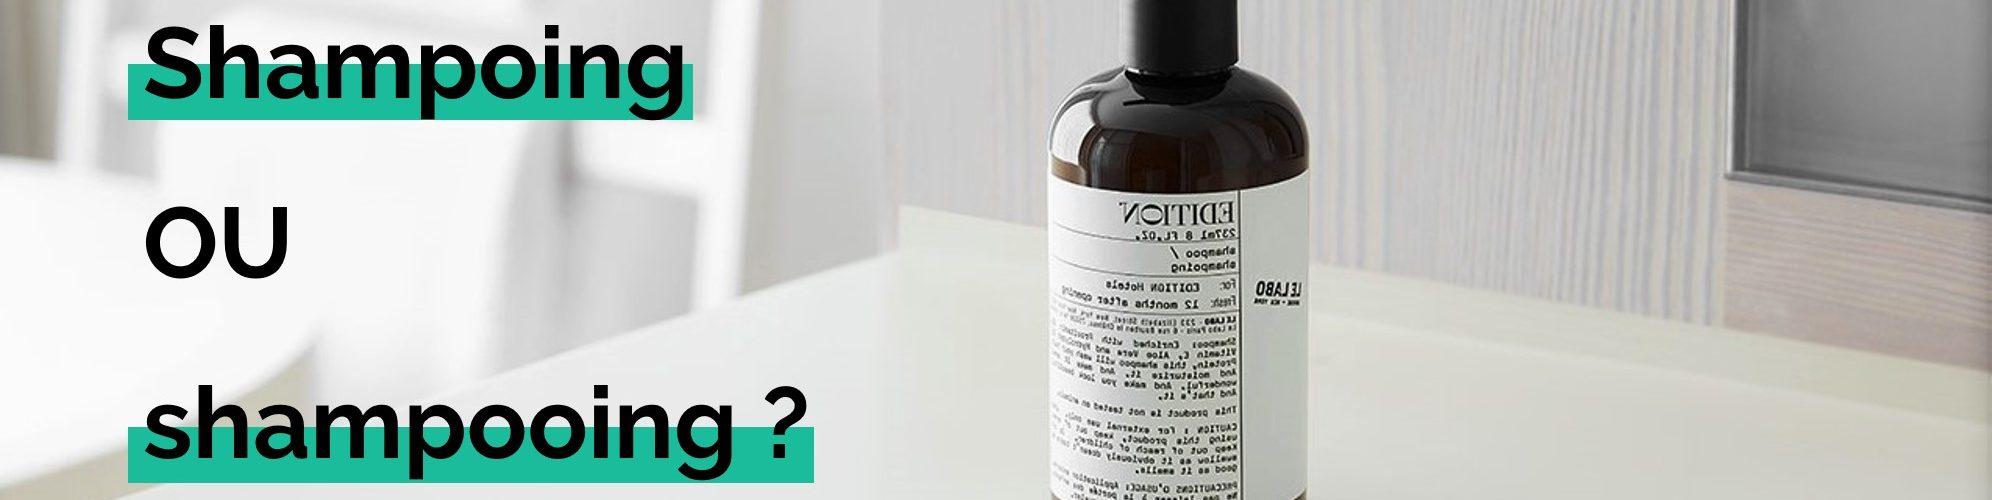 Shampoing ou shampooing